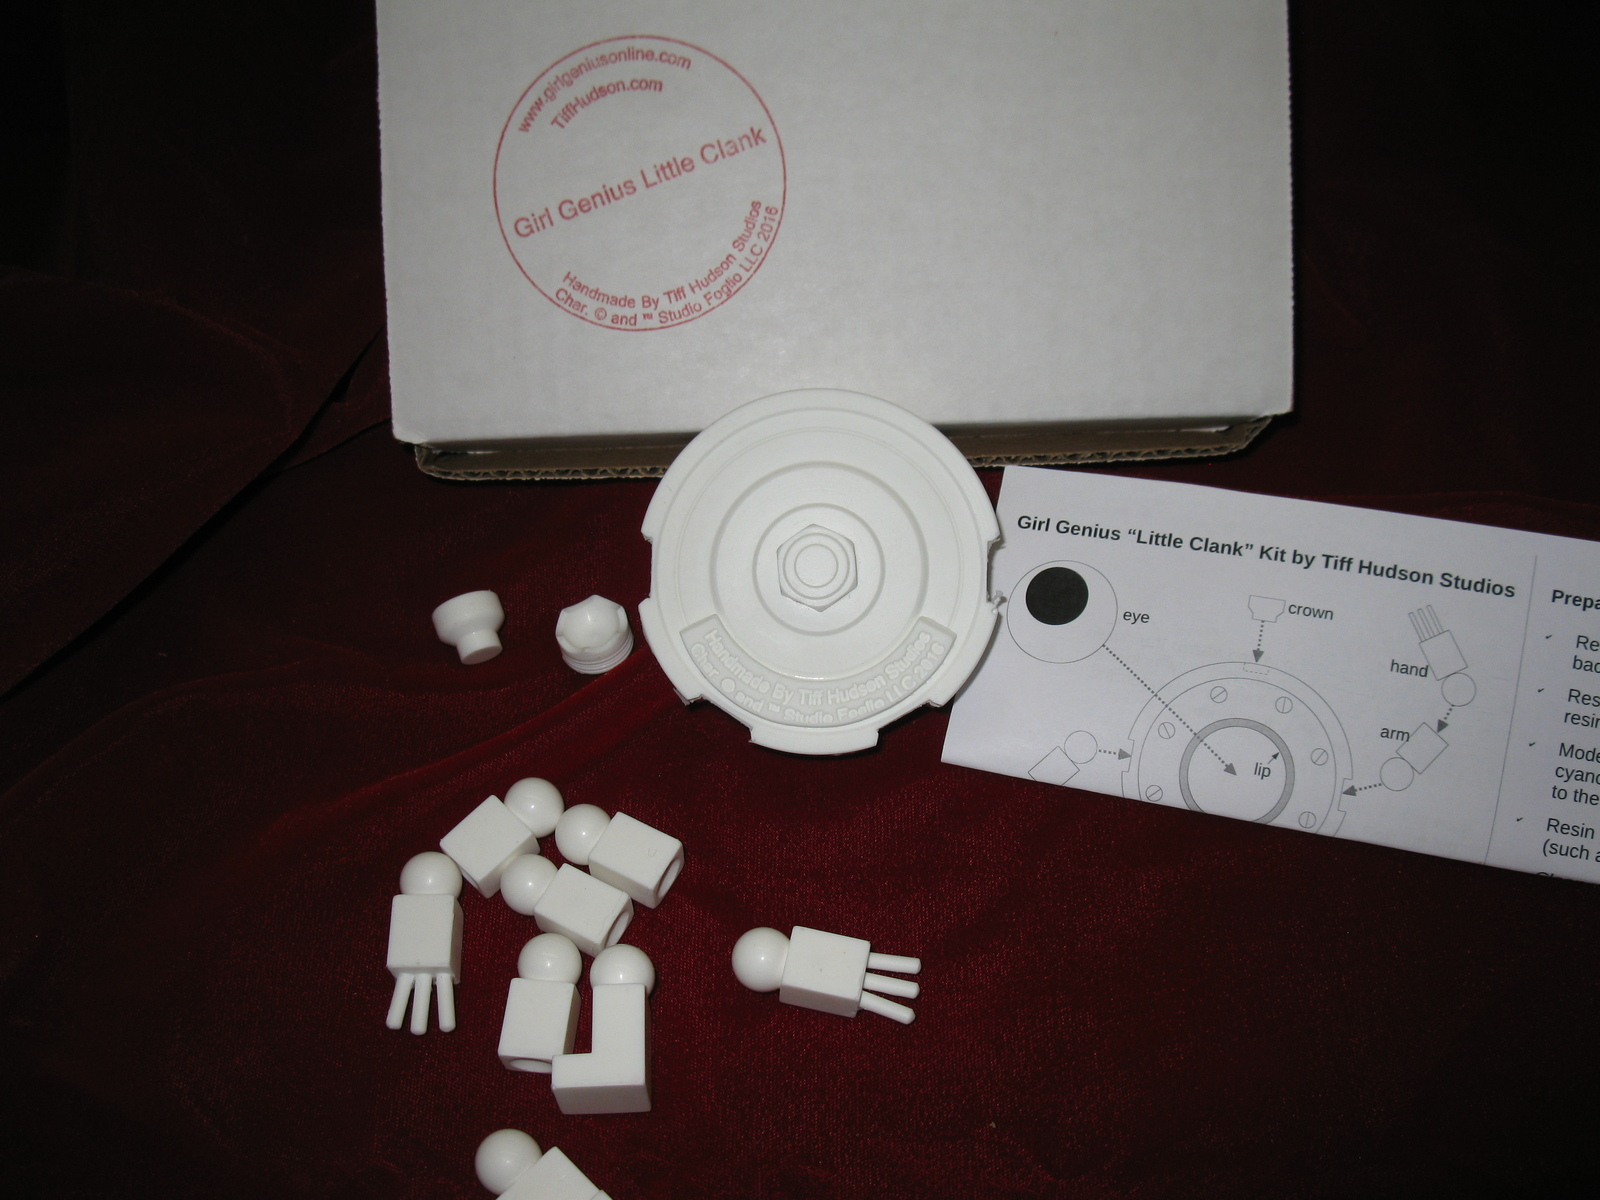 "Licensed Handmade Kit! Girl Genius Little Clank life-size resin figure, 5"" tall!"